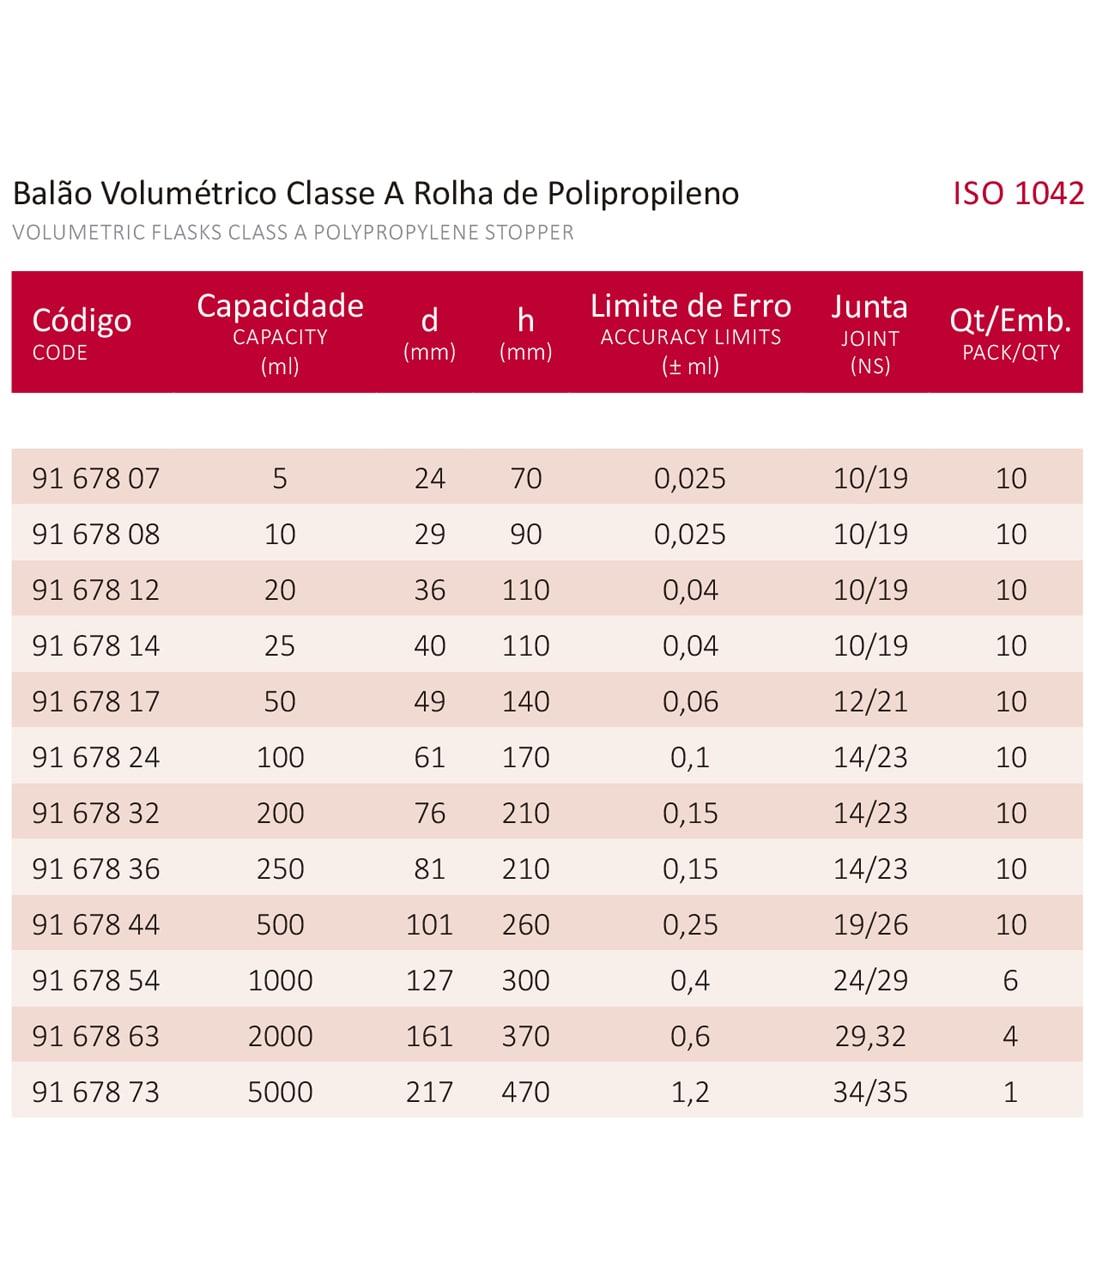 BALÃO VOLUMÉTRICO CLASSE A ROLHA POLI C/ CERTIFICADO RBC 2 ML - Marca Laborglas - Cód. 9167802-R